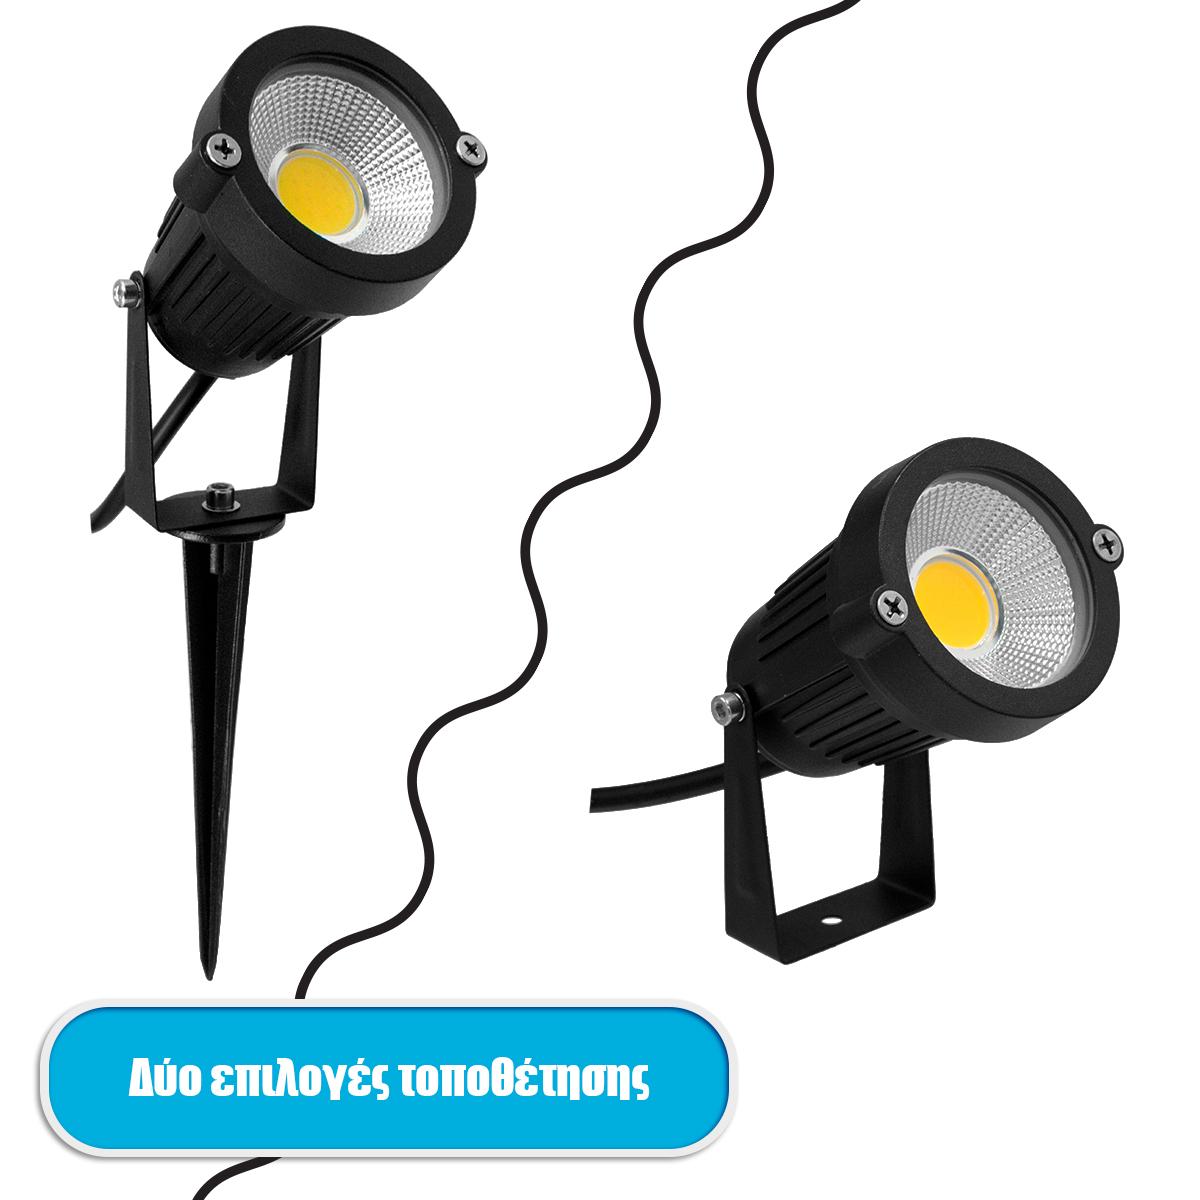 globostar-75583-provolaki-kipou-karfoto-dapedou-bridgelux-cob-led-10w-1100lm-35-dc-12-24v-adiavroho-ip67-thermo-leuko-2700k-dimmable